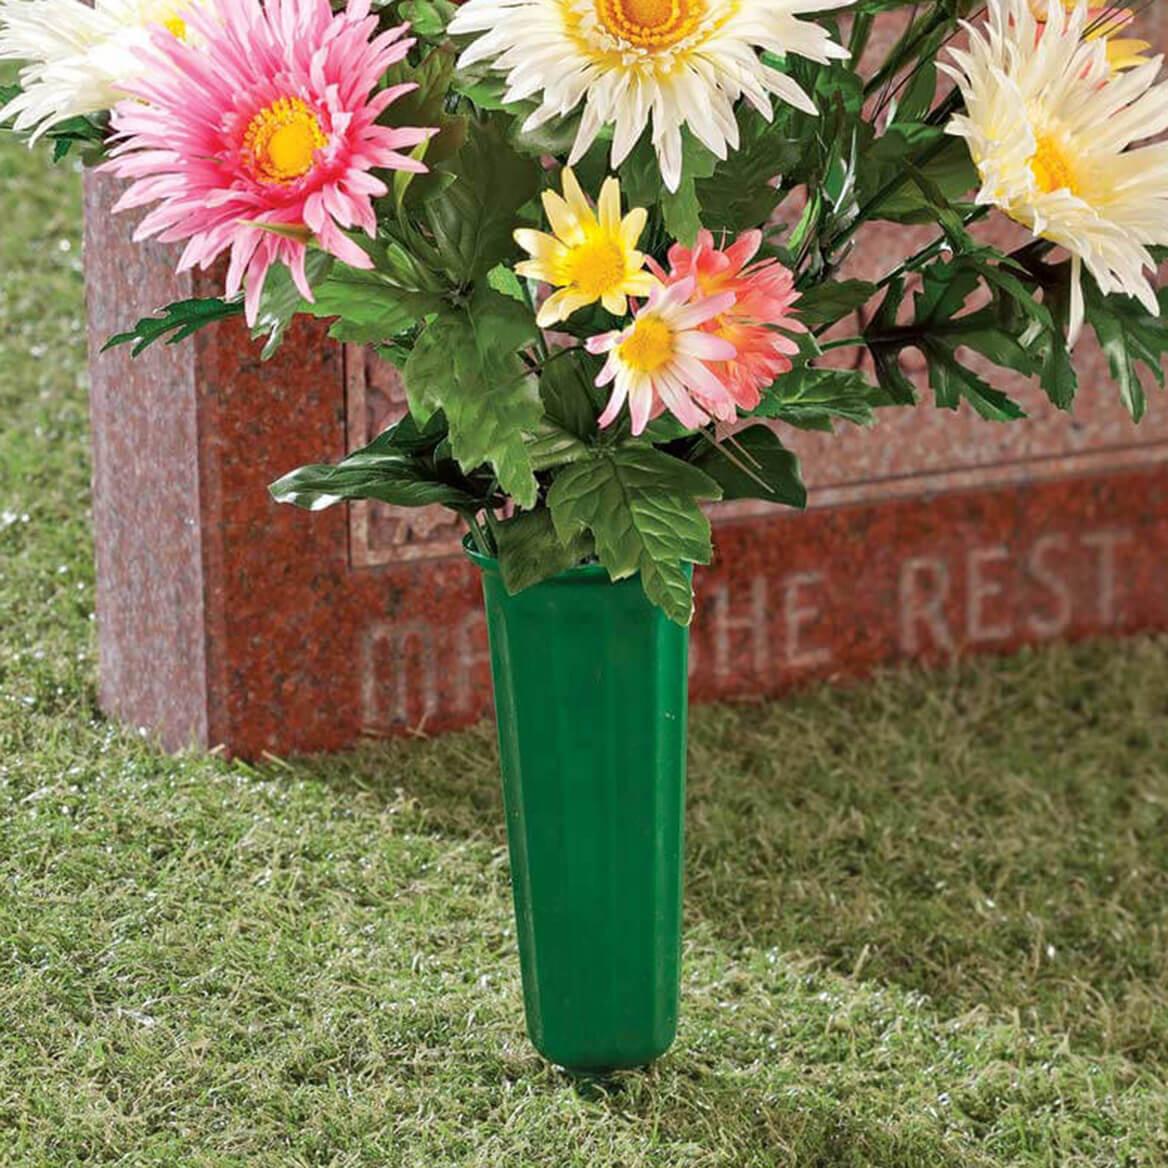 flower vases for headstones of in ground cemetery vases pics vases for cemetery flowers vase and within in ground cemetery vases pics vases for cemetery flowers vase and cellar image avorcor